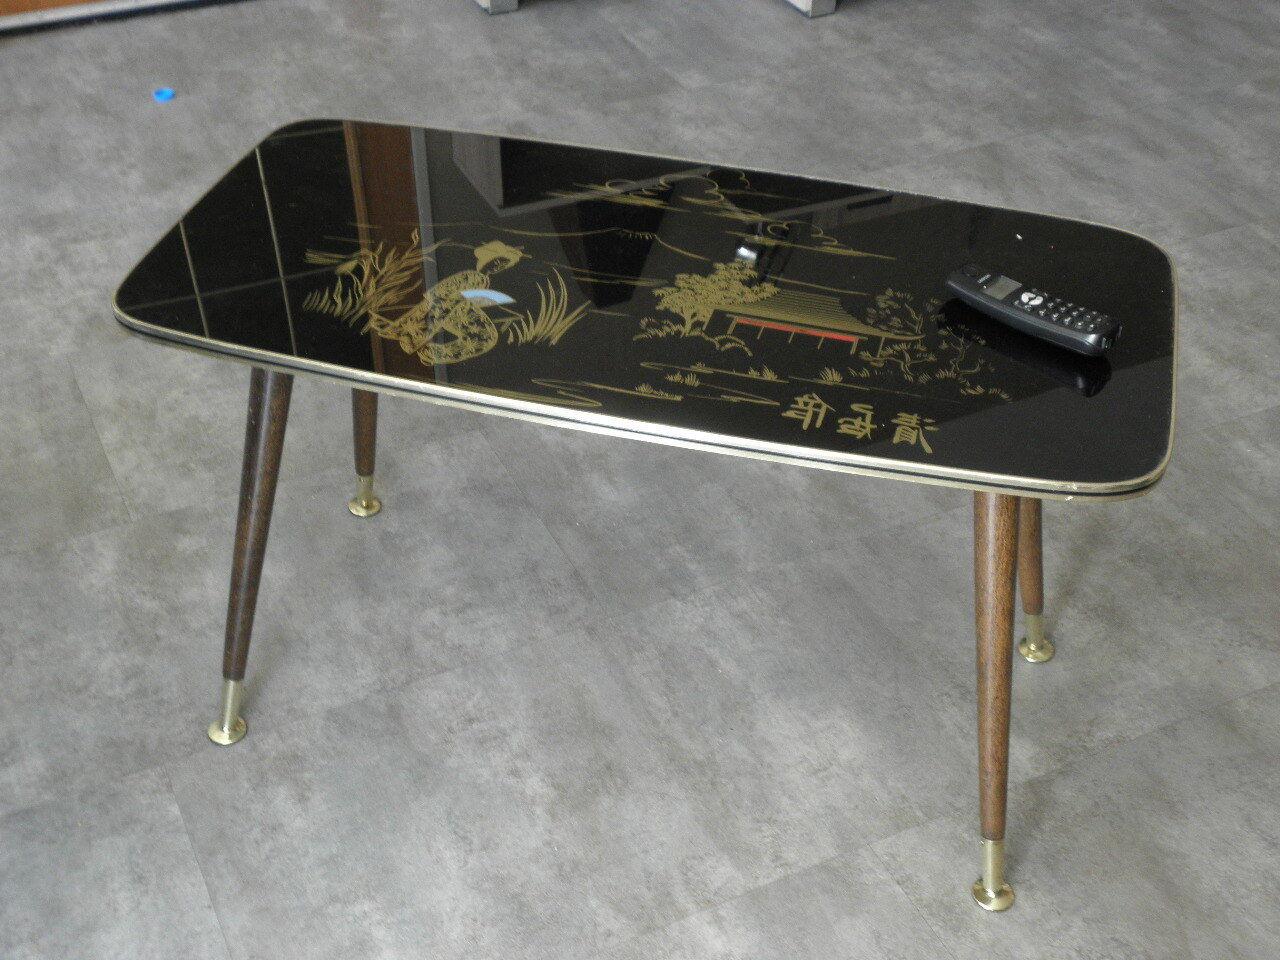 Table Basse En Formica détails sur table basse japonisant formica scandinave design vintage mid  century